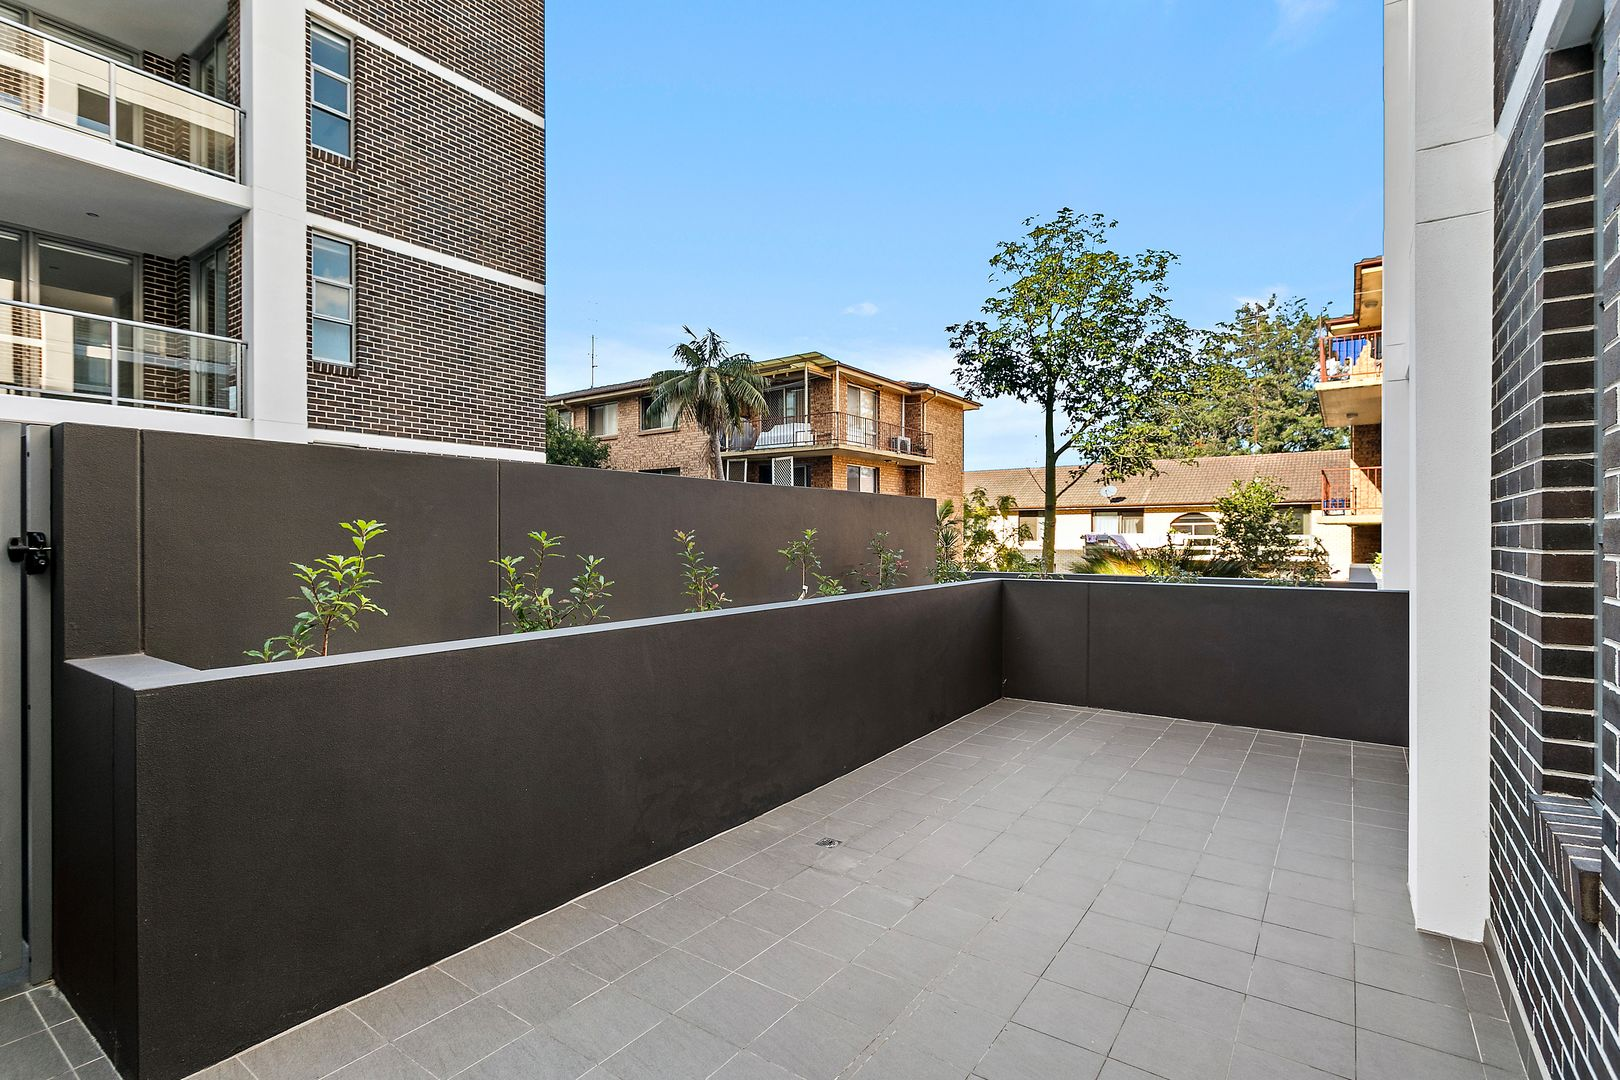 B101/24 Kembla Street, Wollongong NSW 2500, Image 1